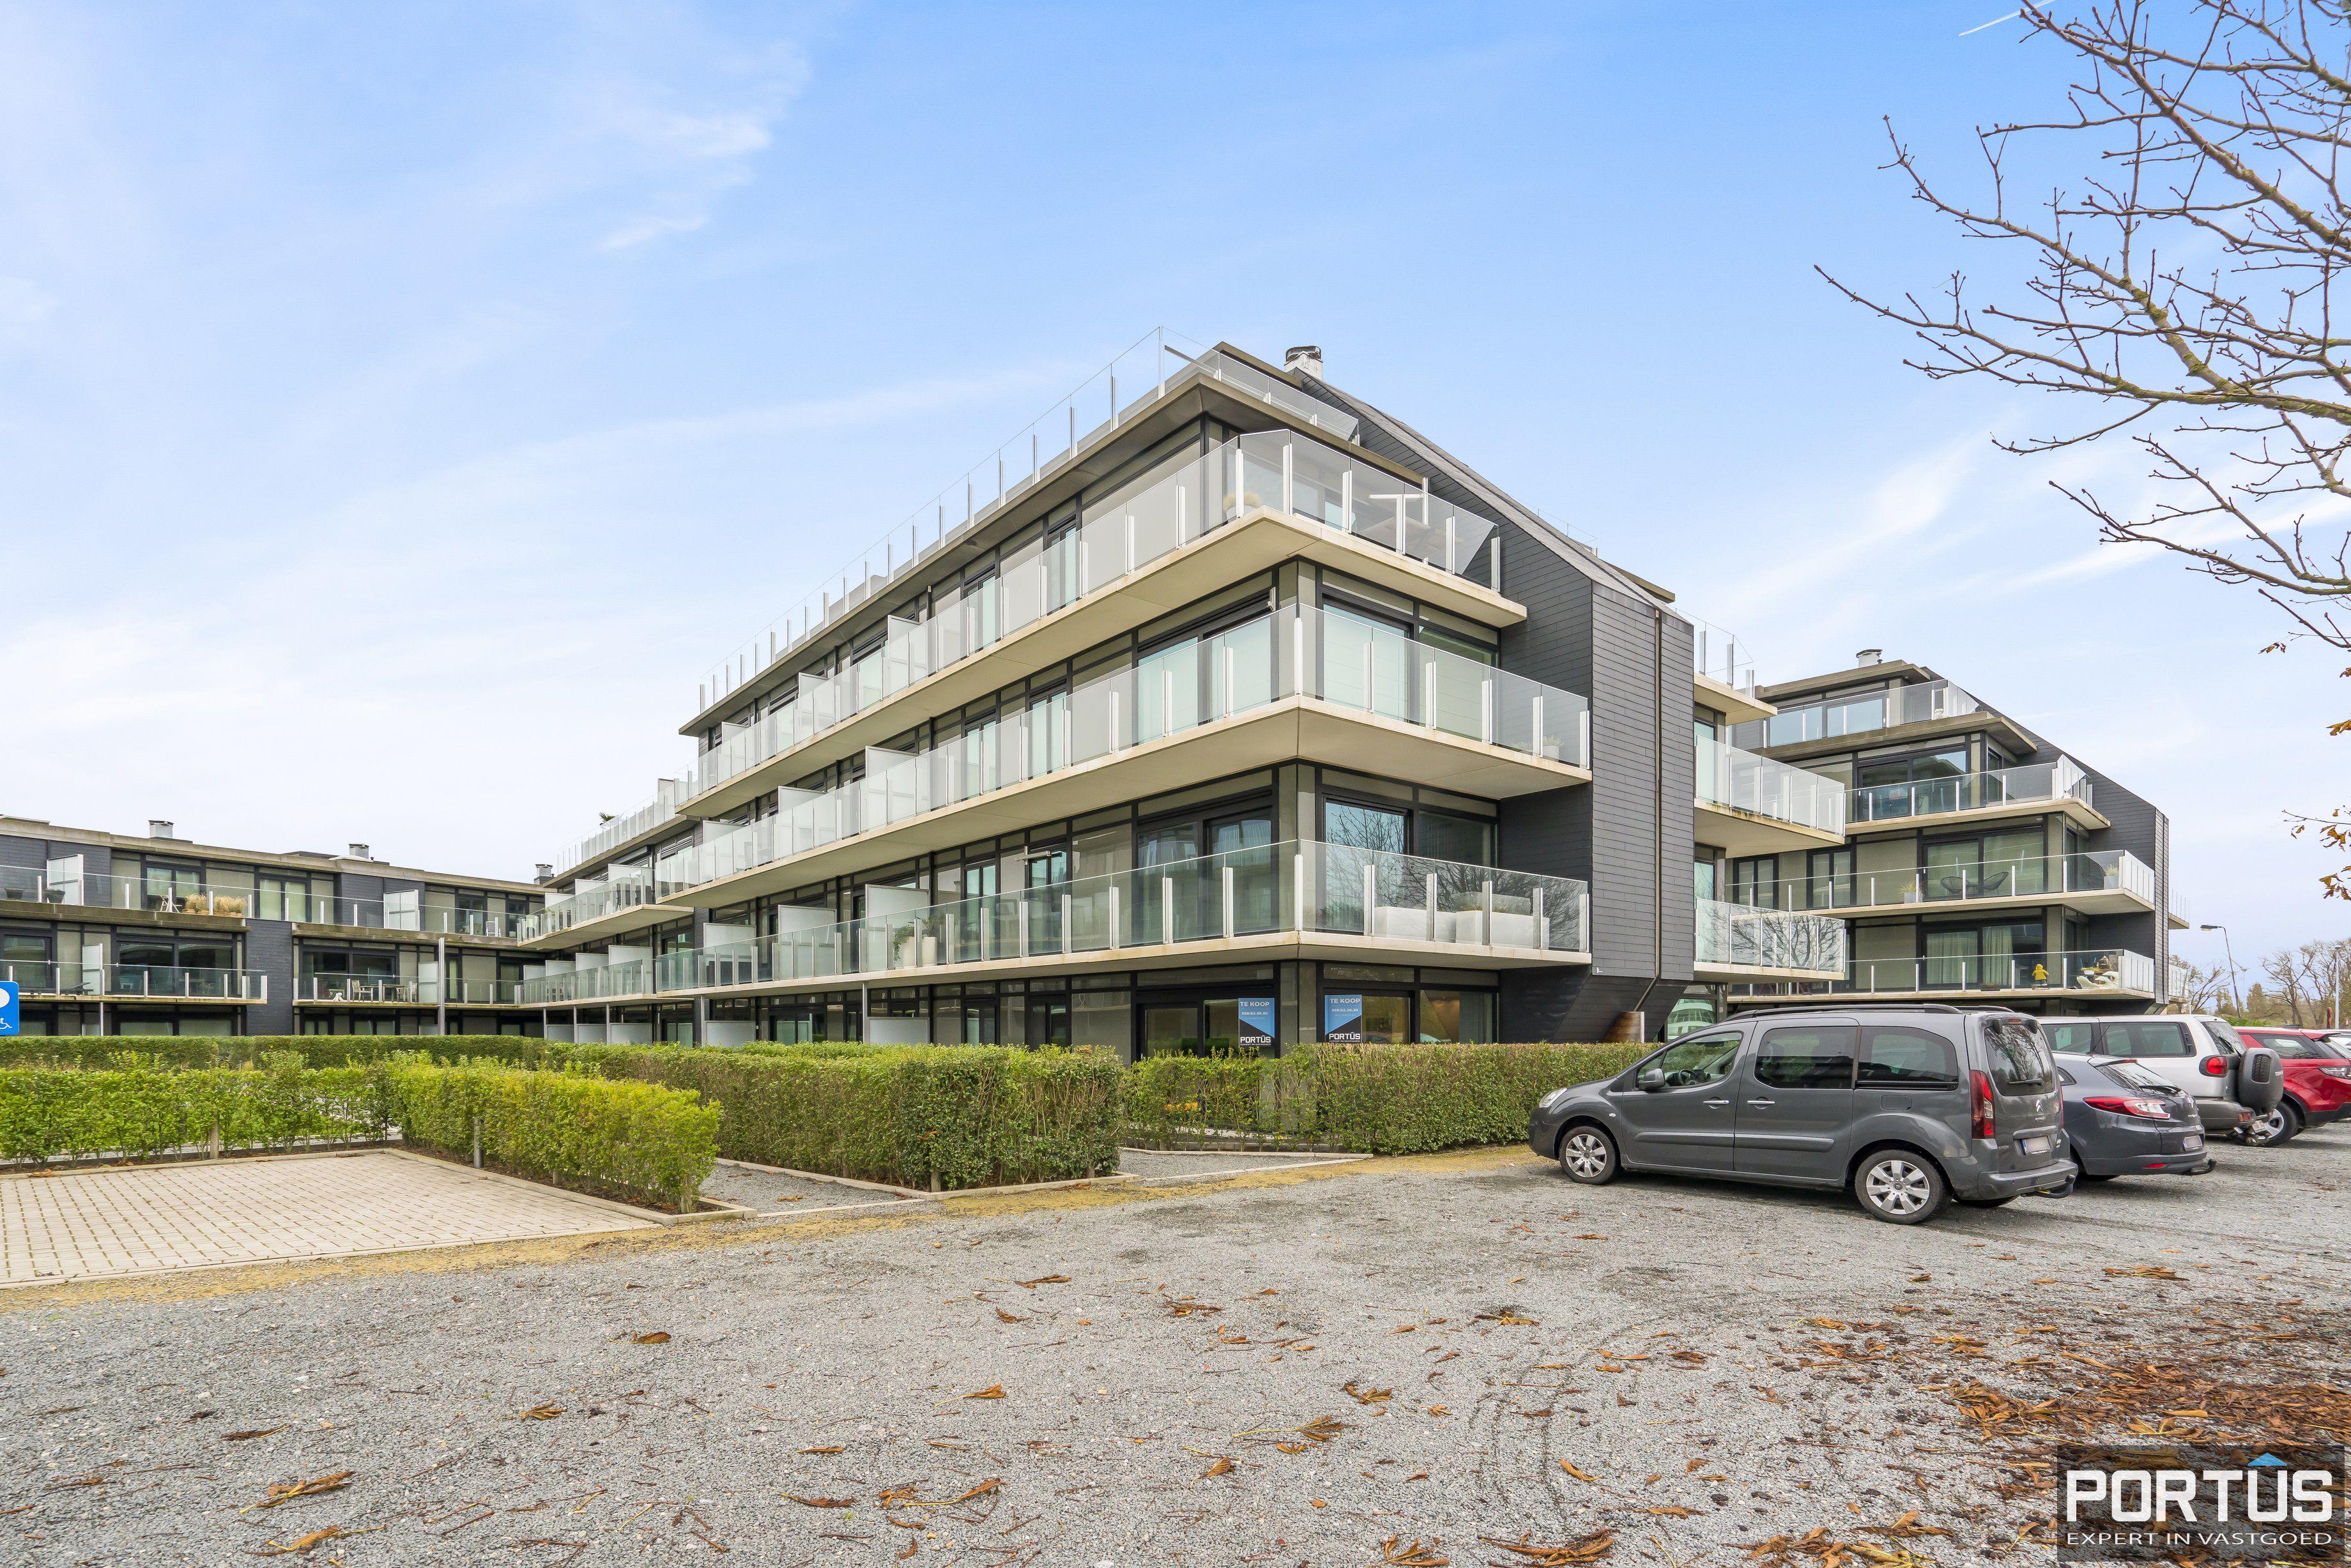 Appartement te koop met 2 slaapkamers in Residentie Waterfront te Nieuwpoort - 11874